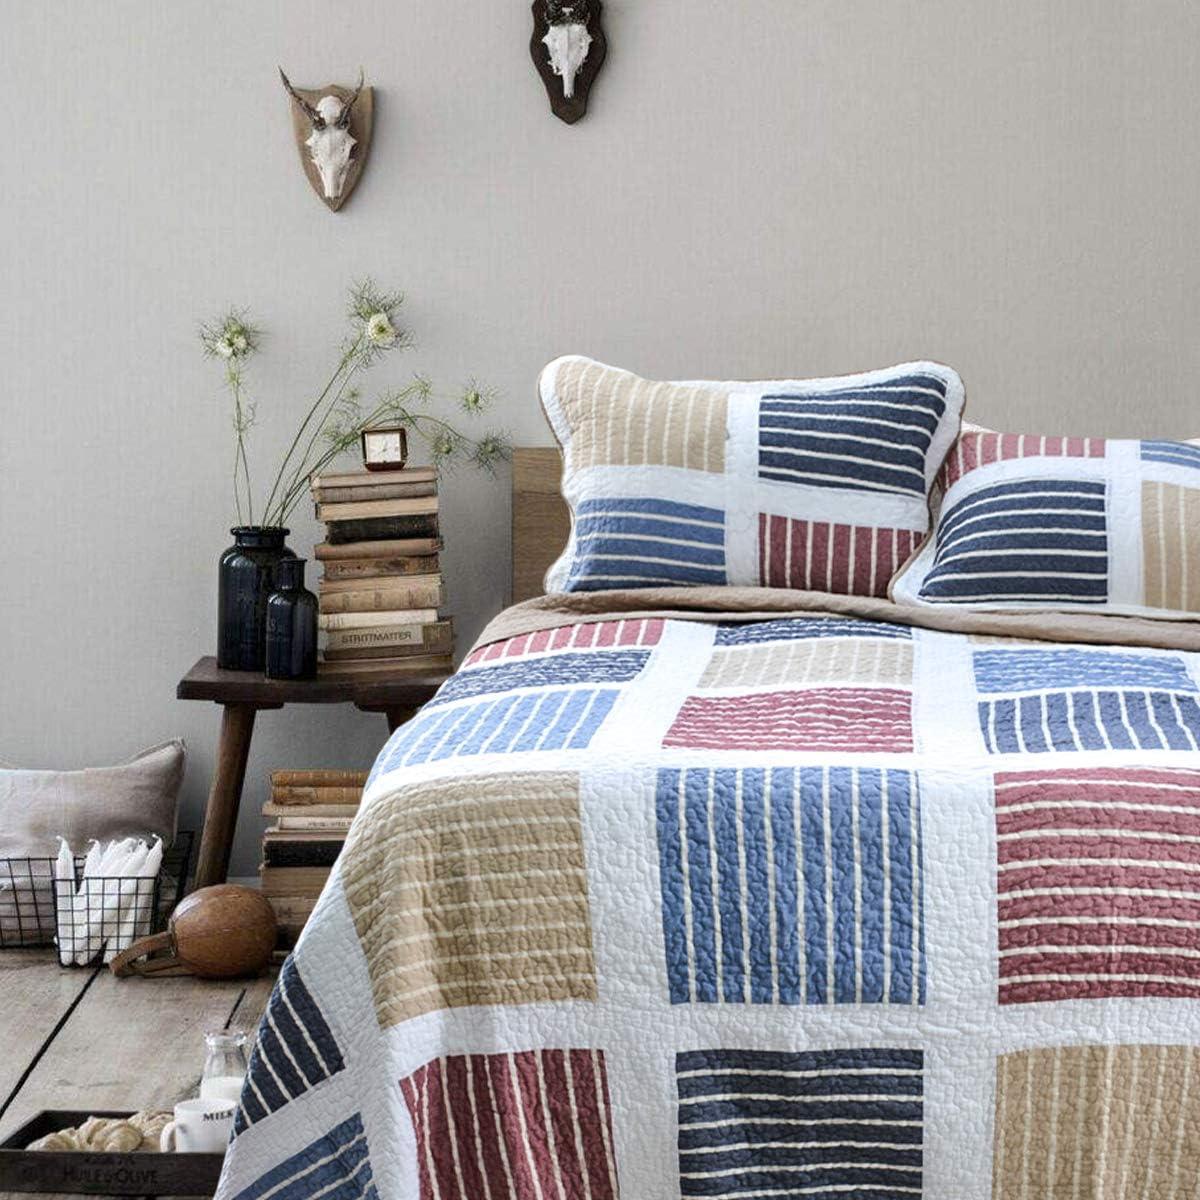 Reversible Coverlet Bedspread for Girls//Boy//Men//Women,Queen Size 3 Piece Satbuy Quilt Bedding Set Blue Pink Beige Plaid Striped Patchwork 100/% Cotton